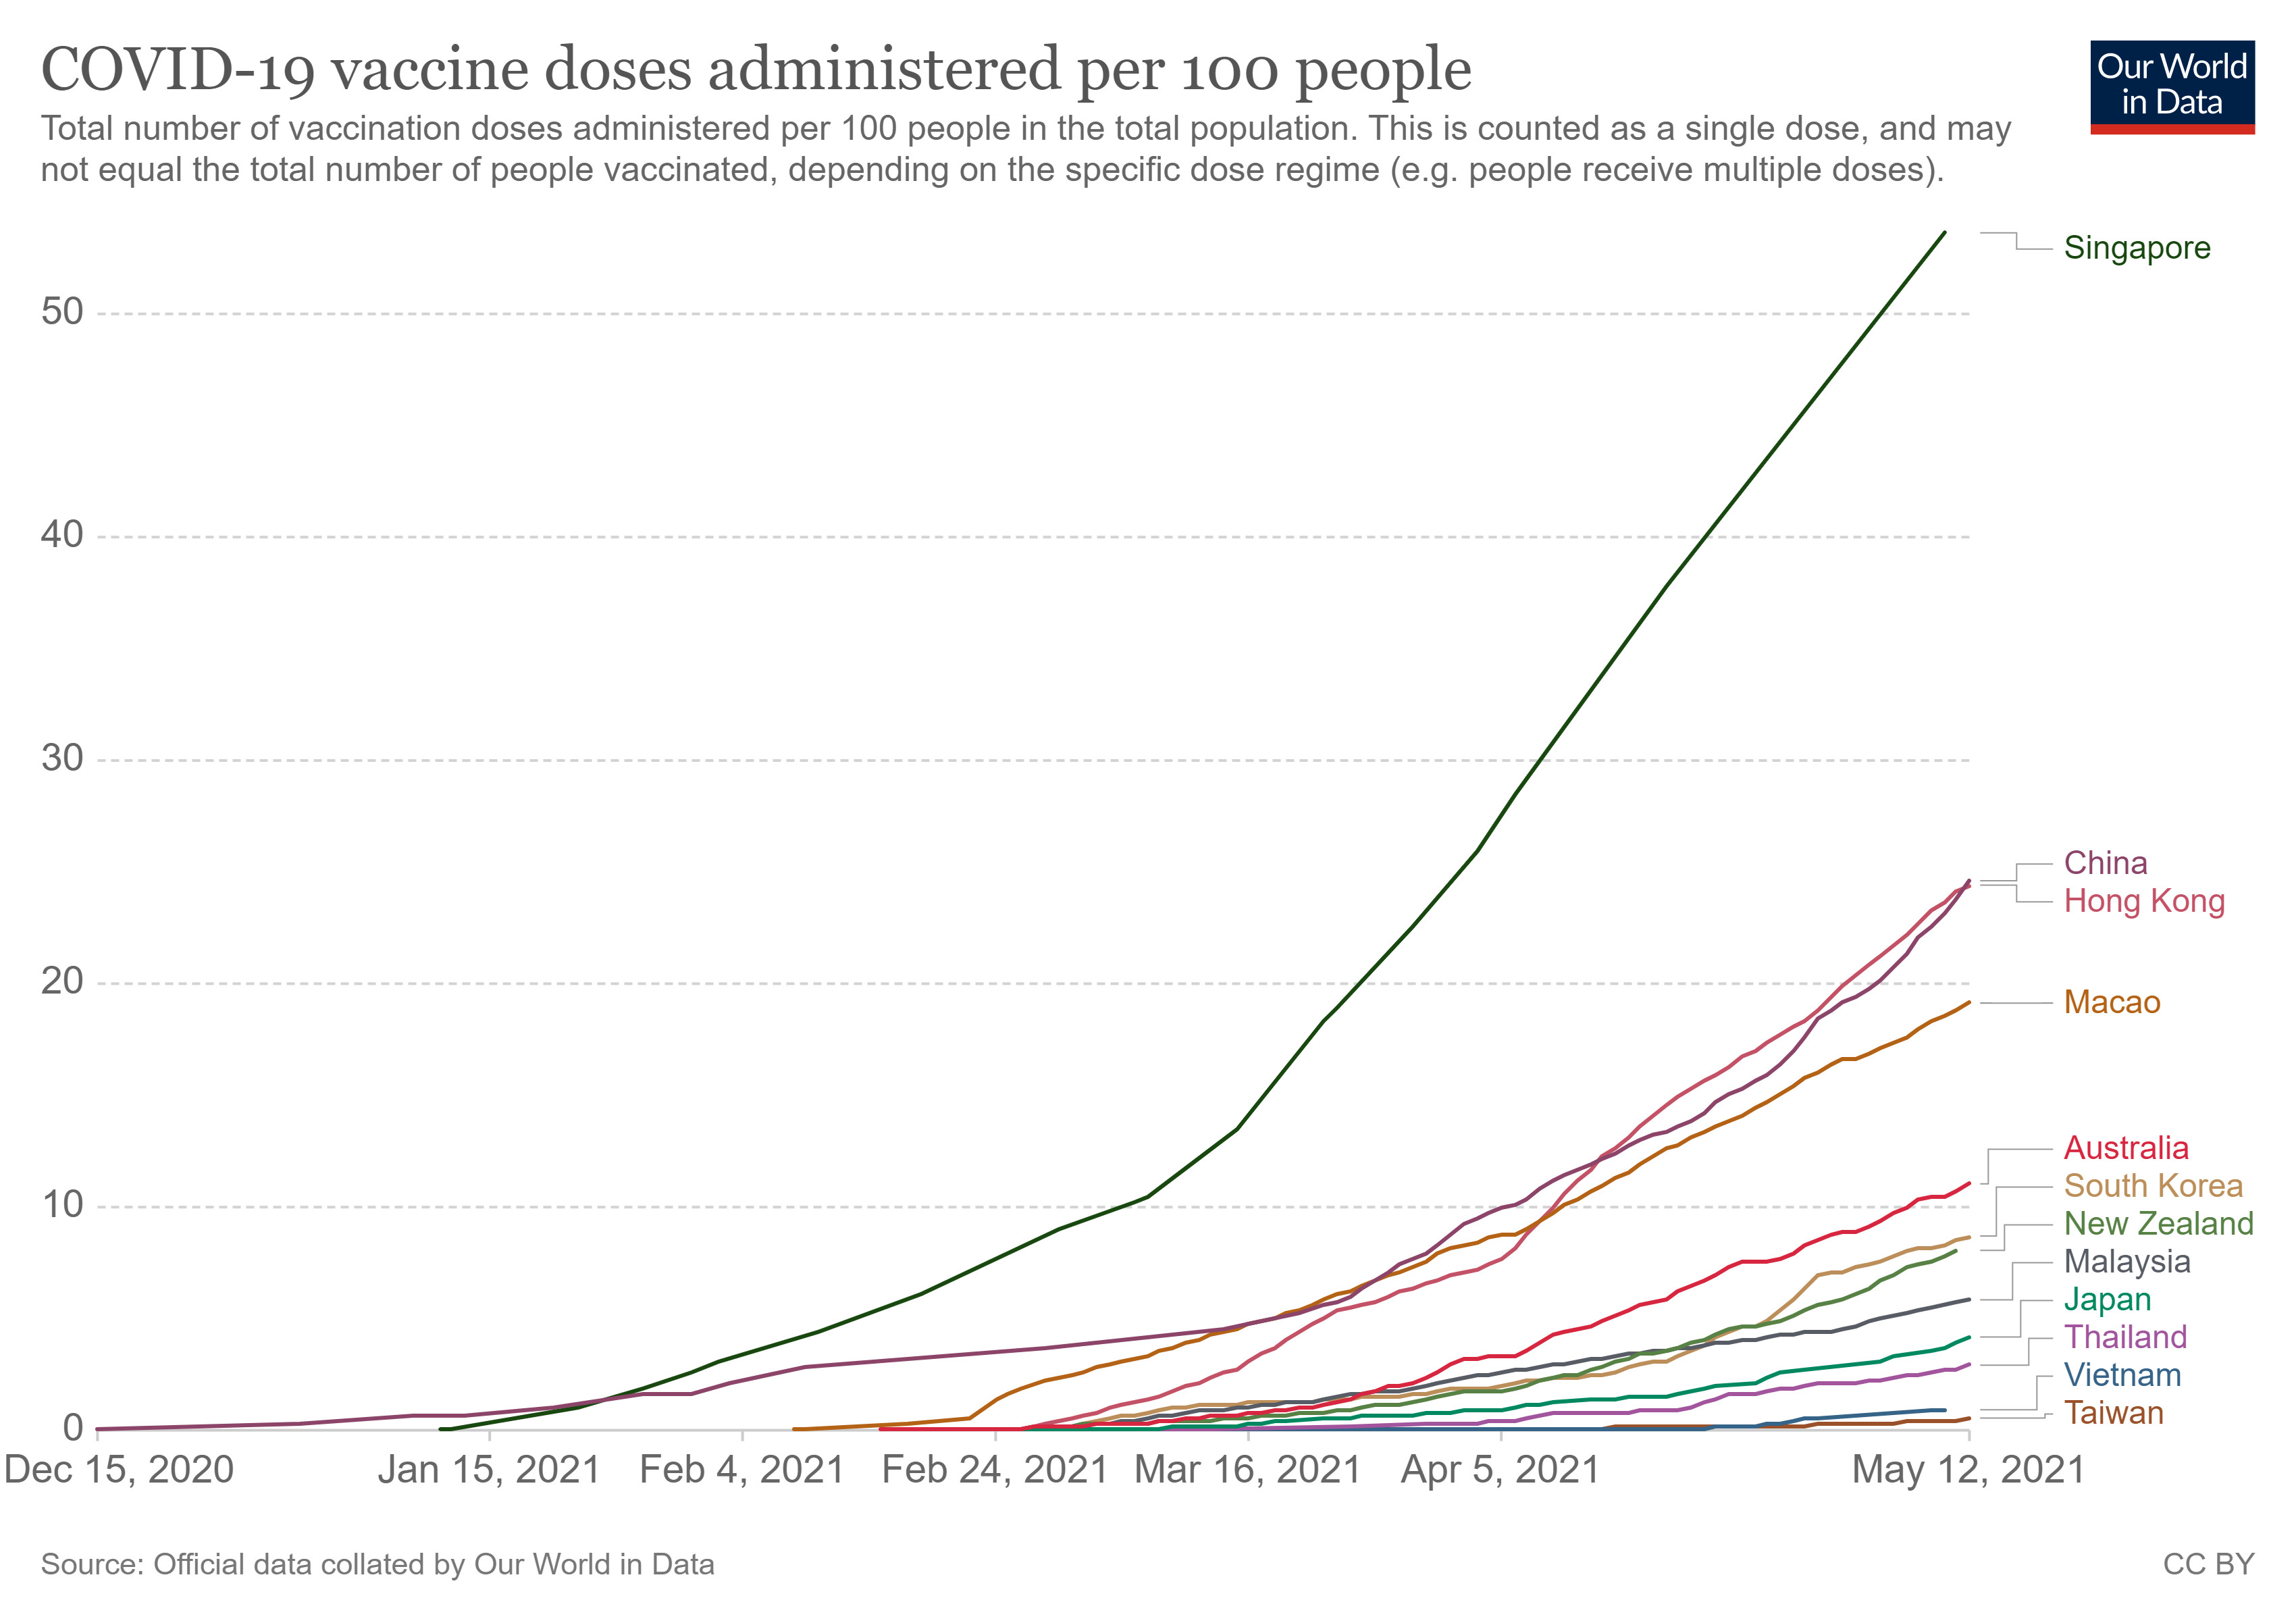 COVID-19,疫情,邊境管制,澳洲,台灣,印度,社區感染,群聚感染,諾富特,基因定序,覆蓋率,萬華,和平醫院,清零,封城,陳時中,疫情指揮中心